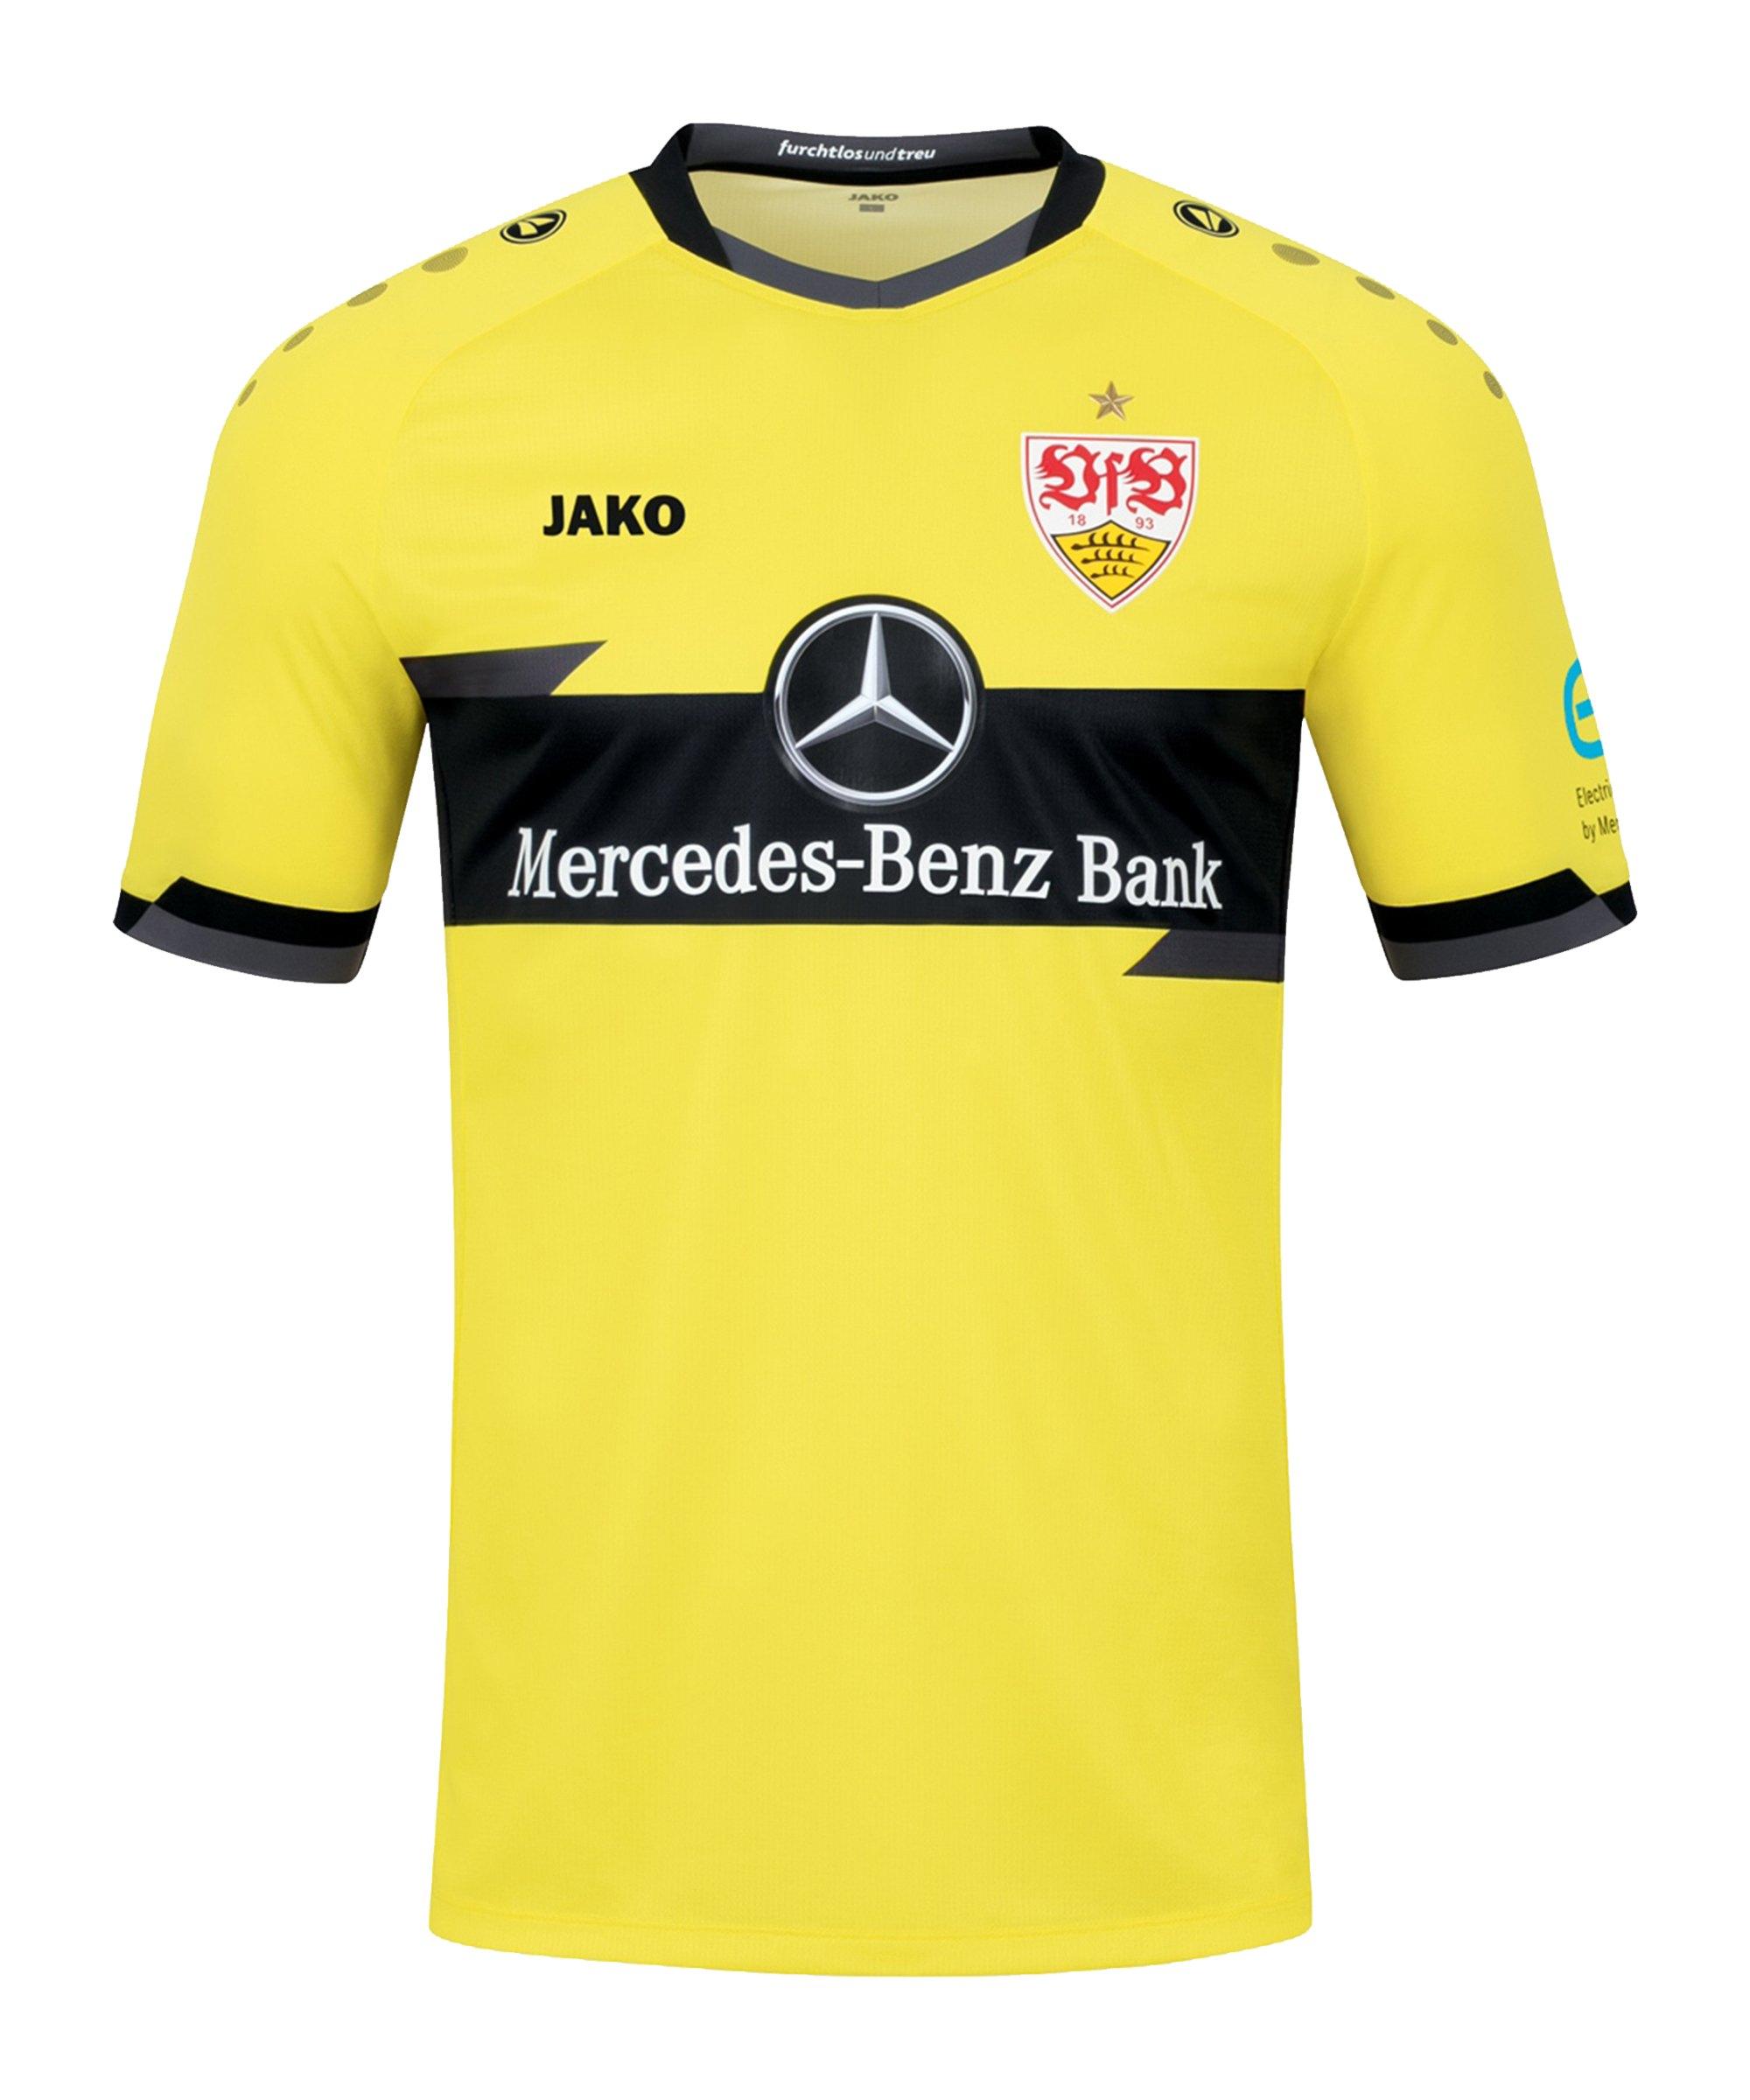 JAKO VfB Stuttgart TW-Trikot Home 2021/2022 Gelb F630 - gelb